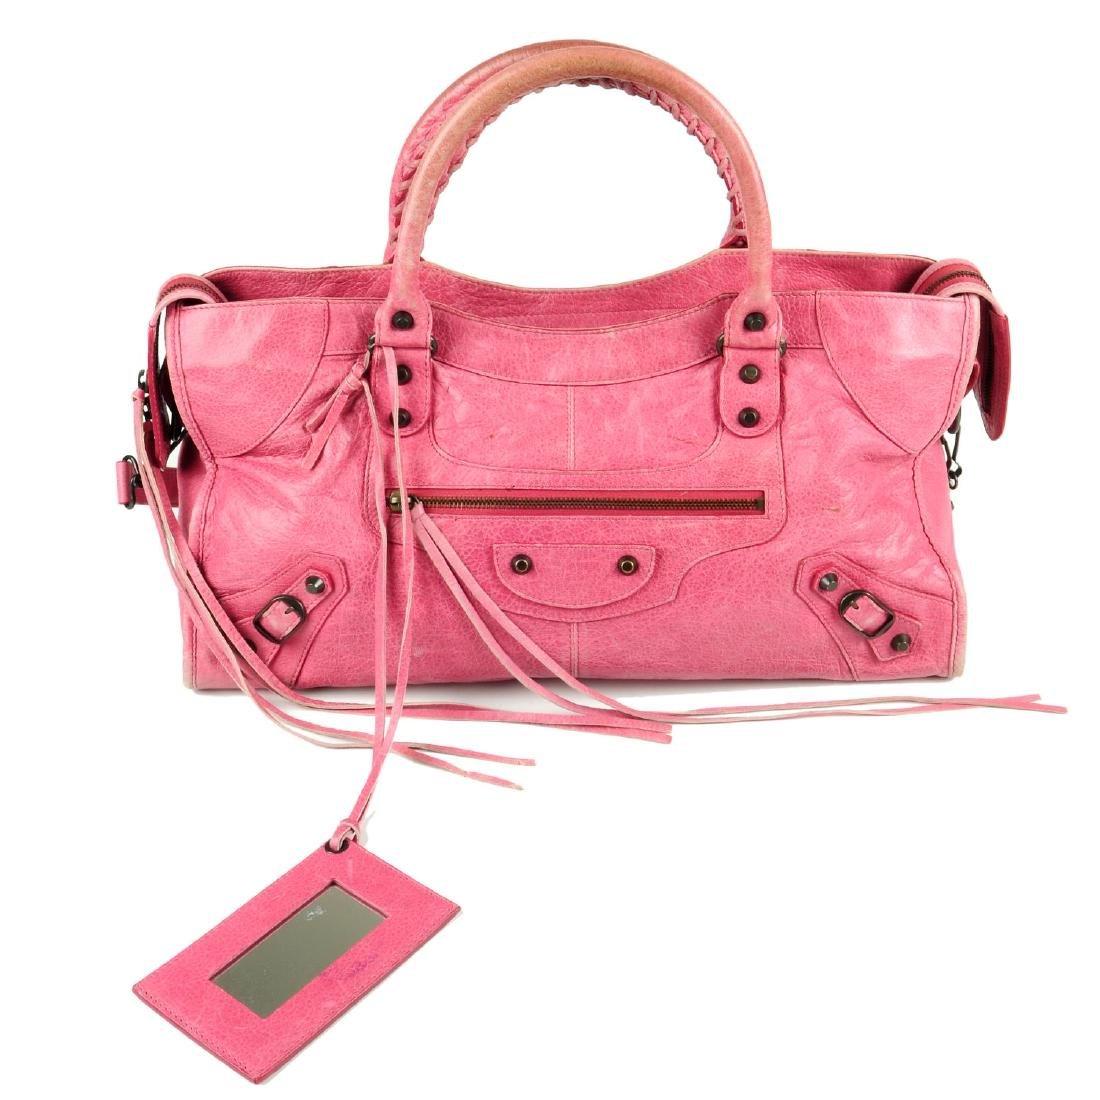 BALENCIAGA - a pink Part-Time handbag. Crafted from